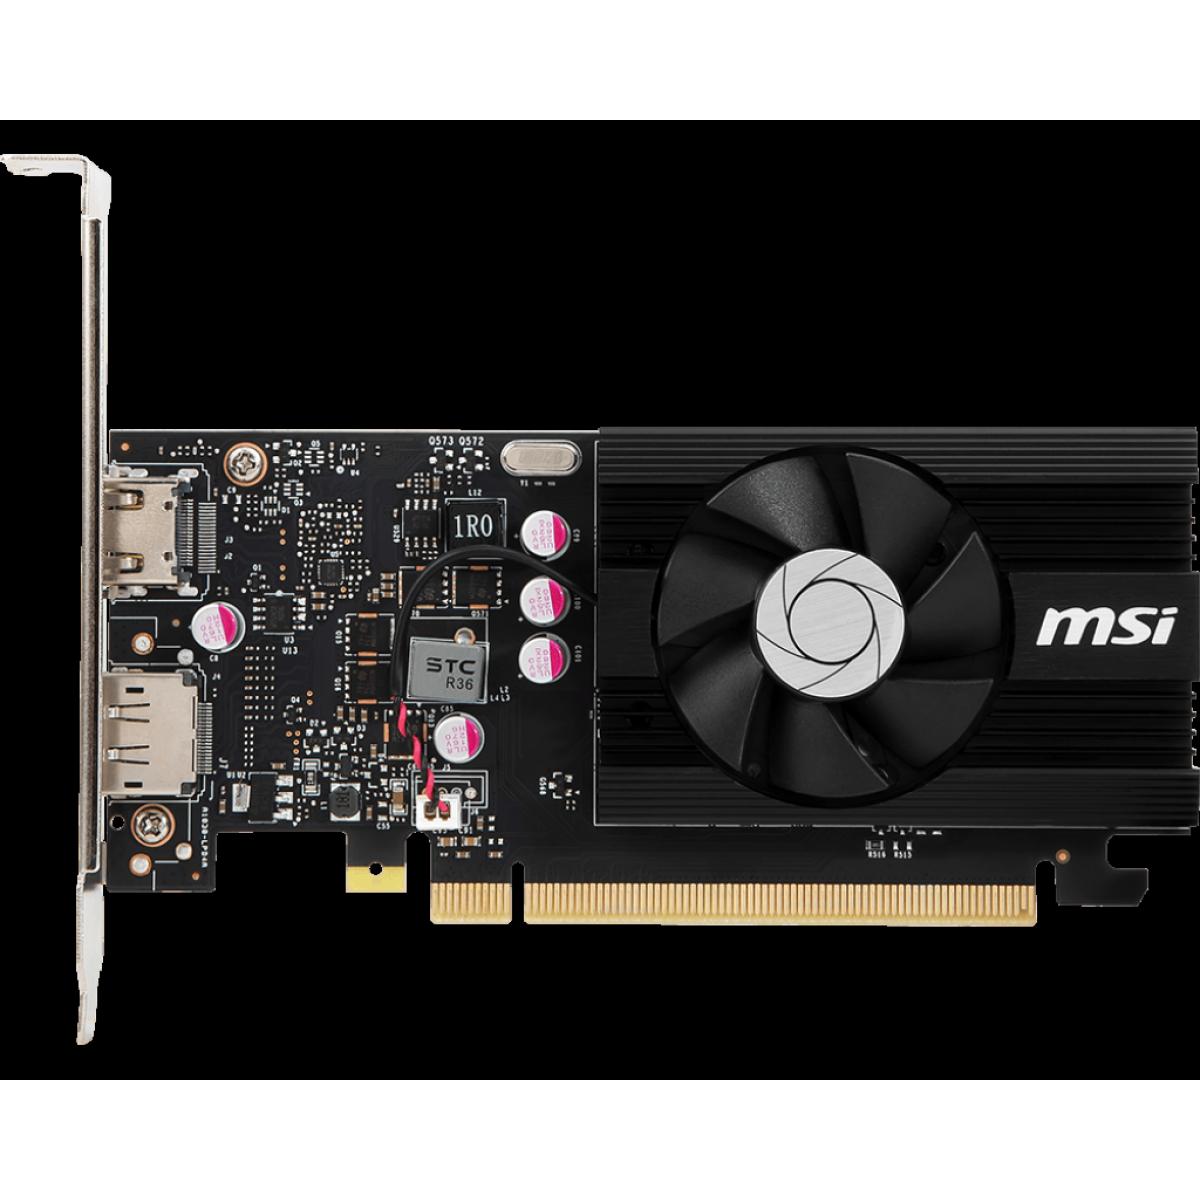 Placa de Vídeo MSI, Geforce, GT 1030 2GD4 LP OC, 2GB, DDR4, 64 bit, 912-V809-2826